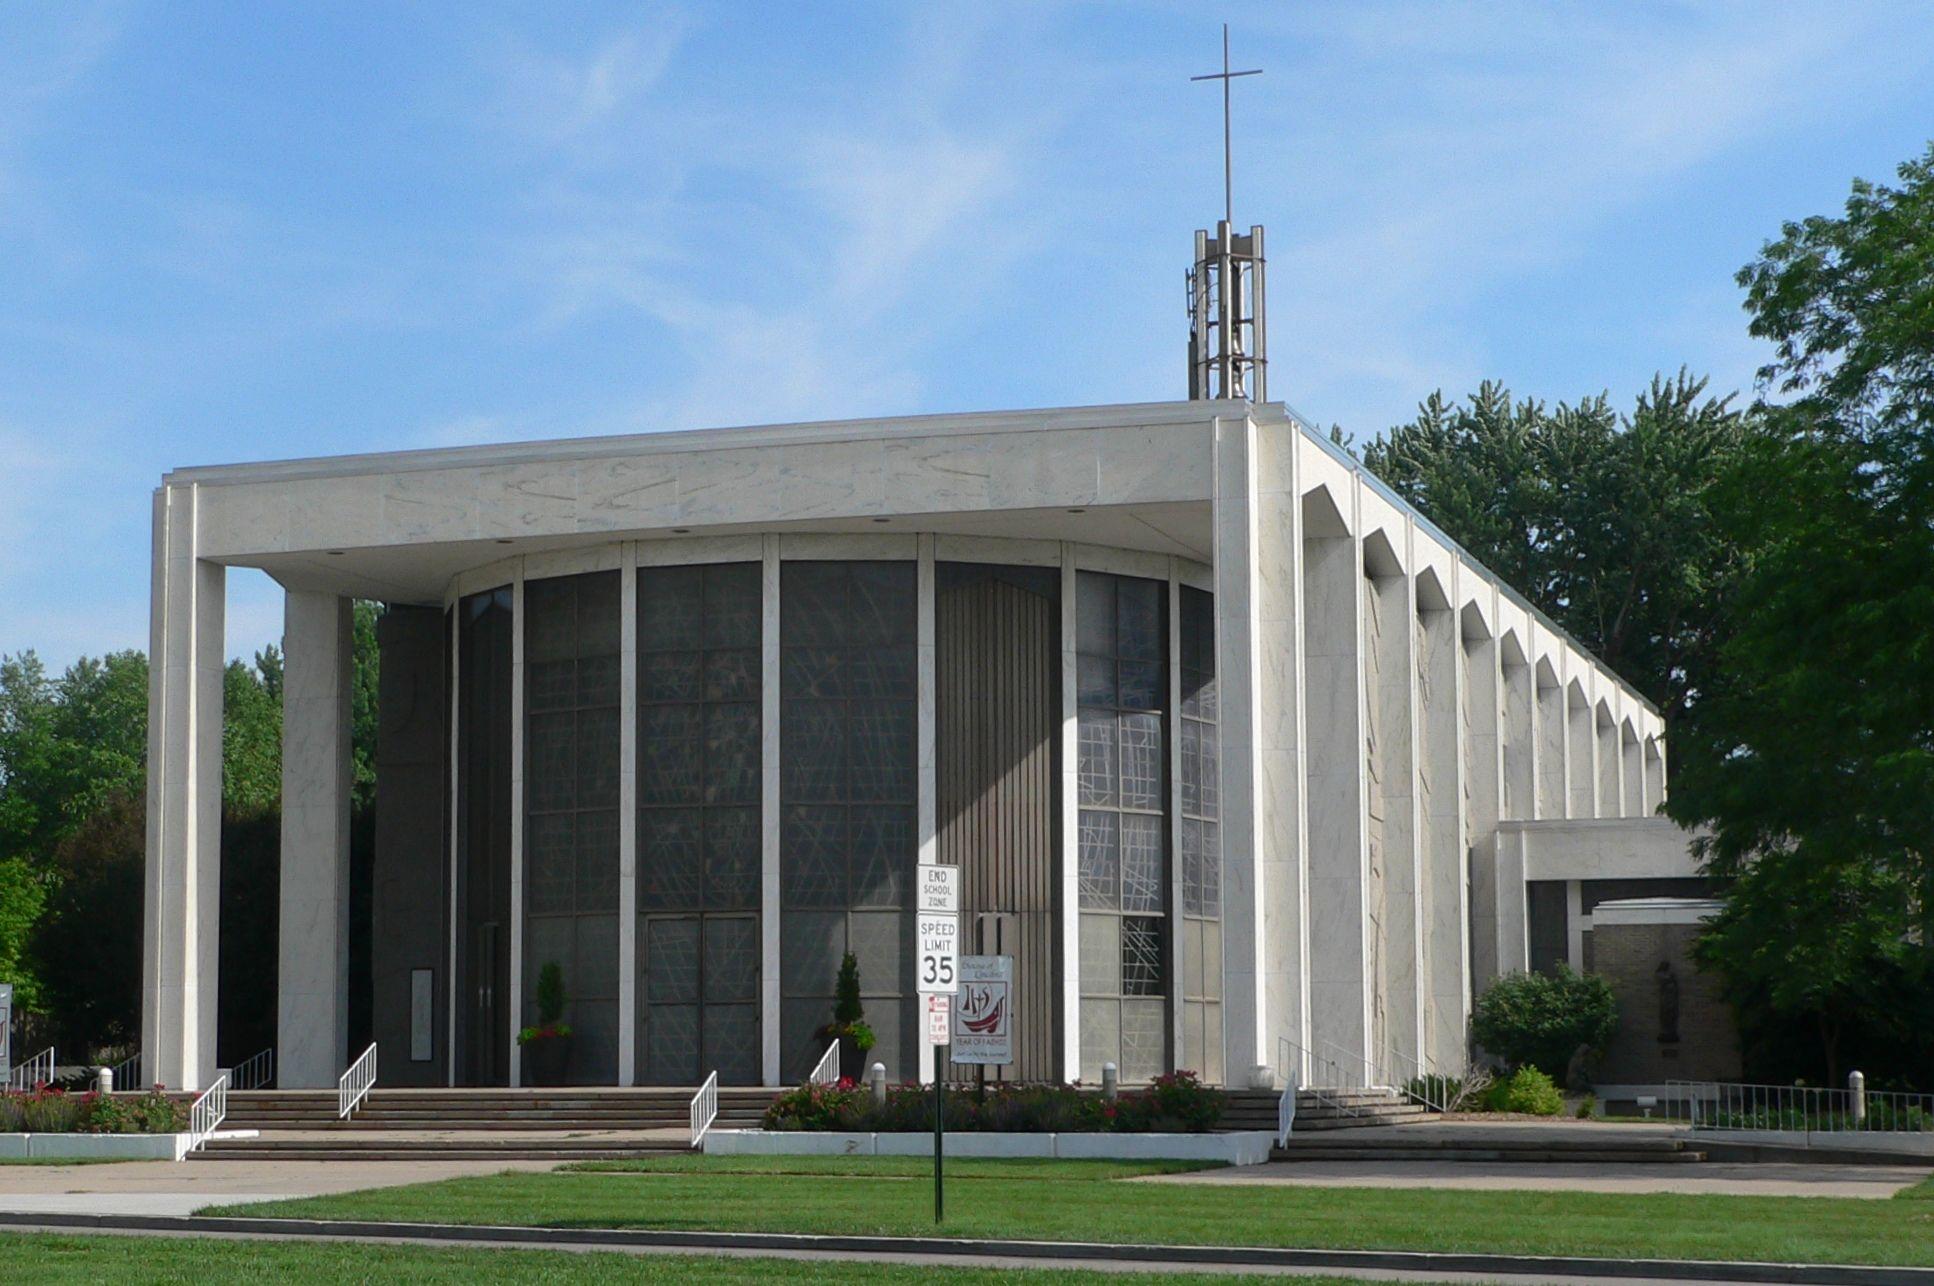 Nebraska Risen Christ Catholic Cathedral in Lincoln, NE